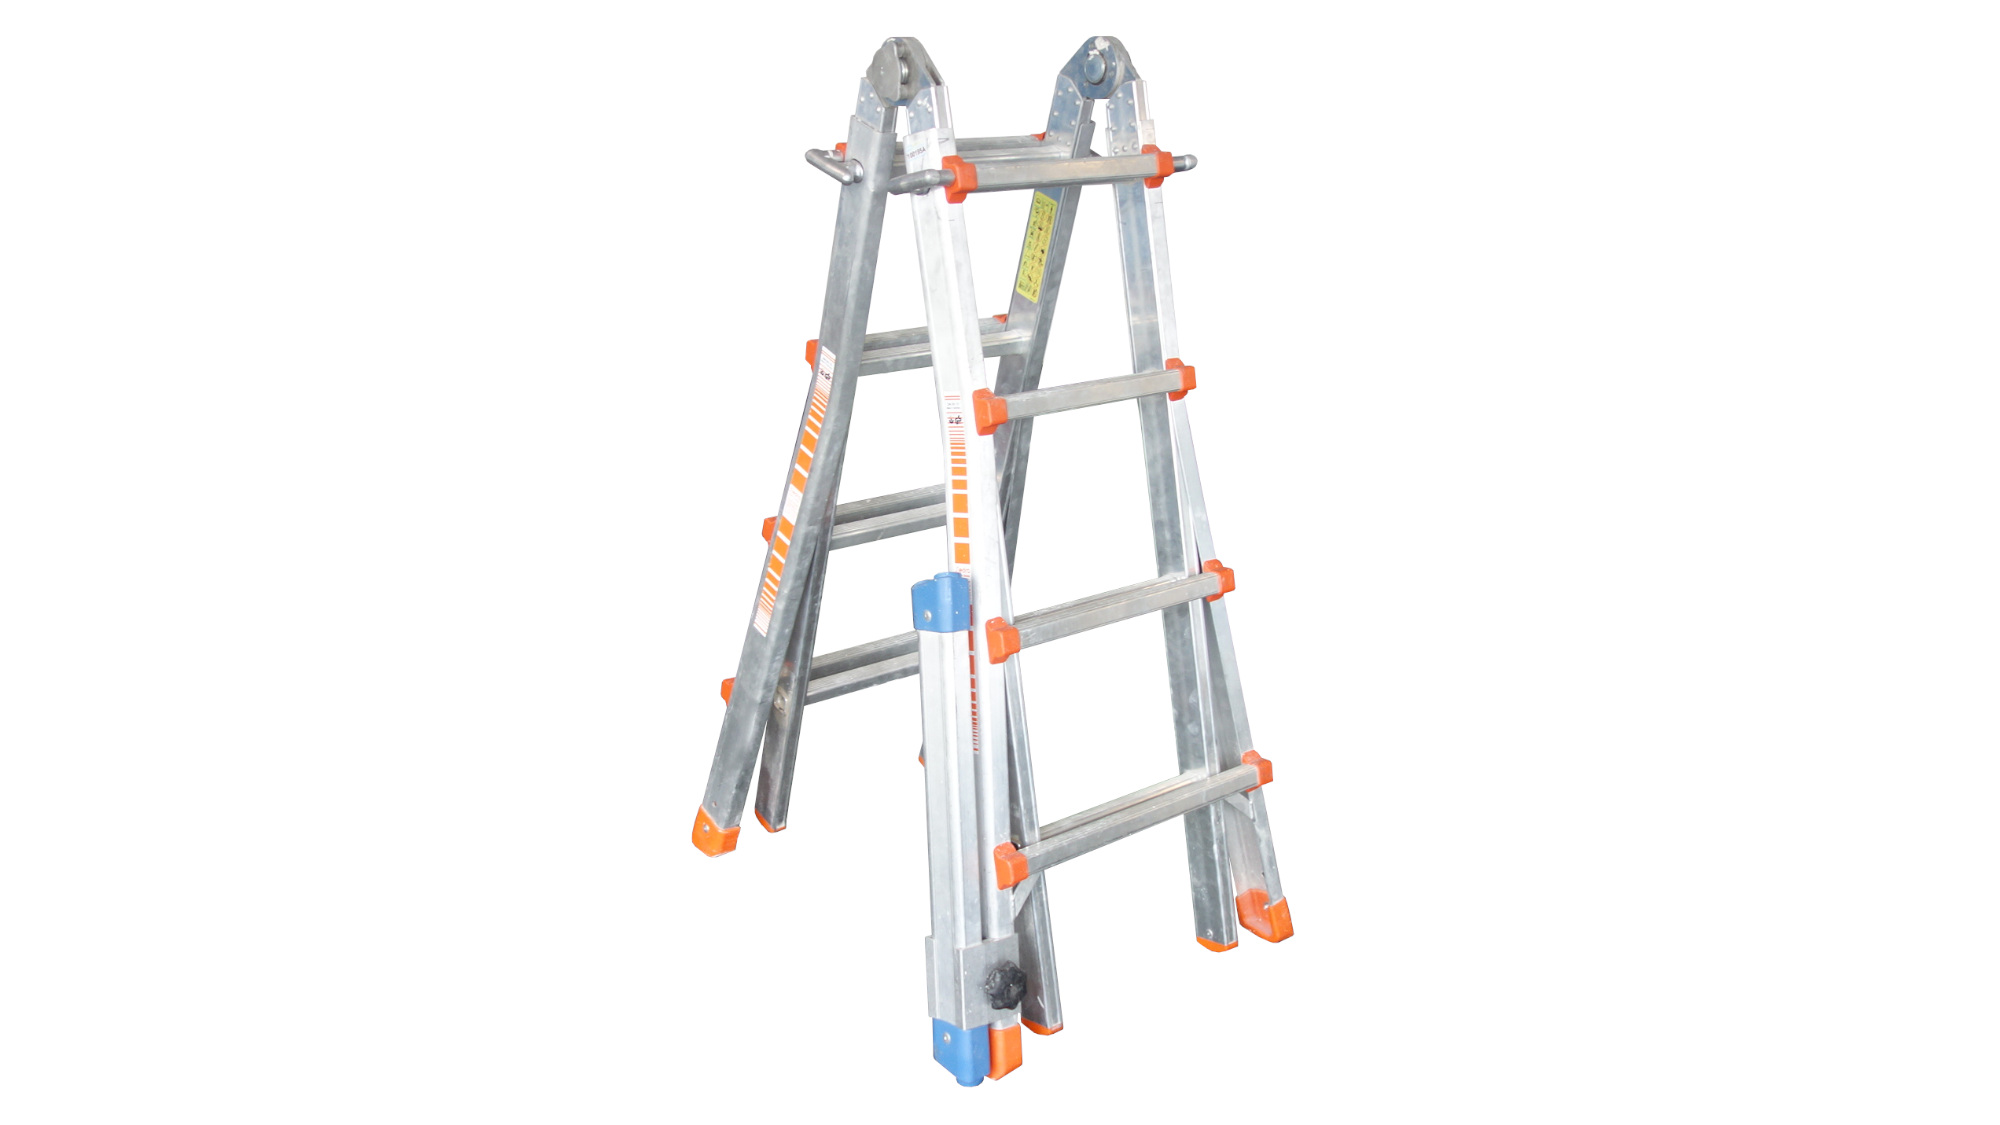 Treppenleiter leihen